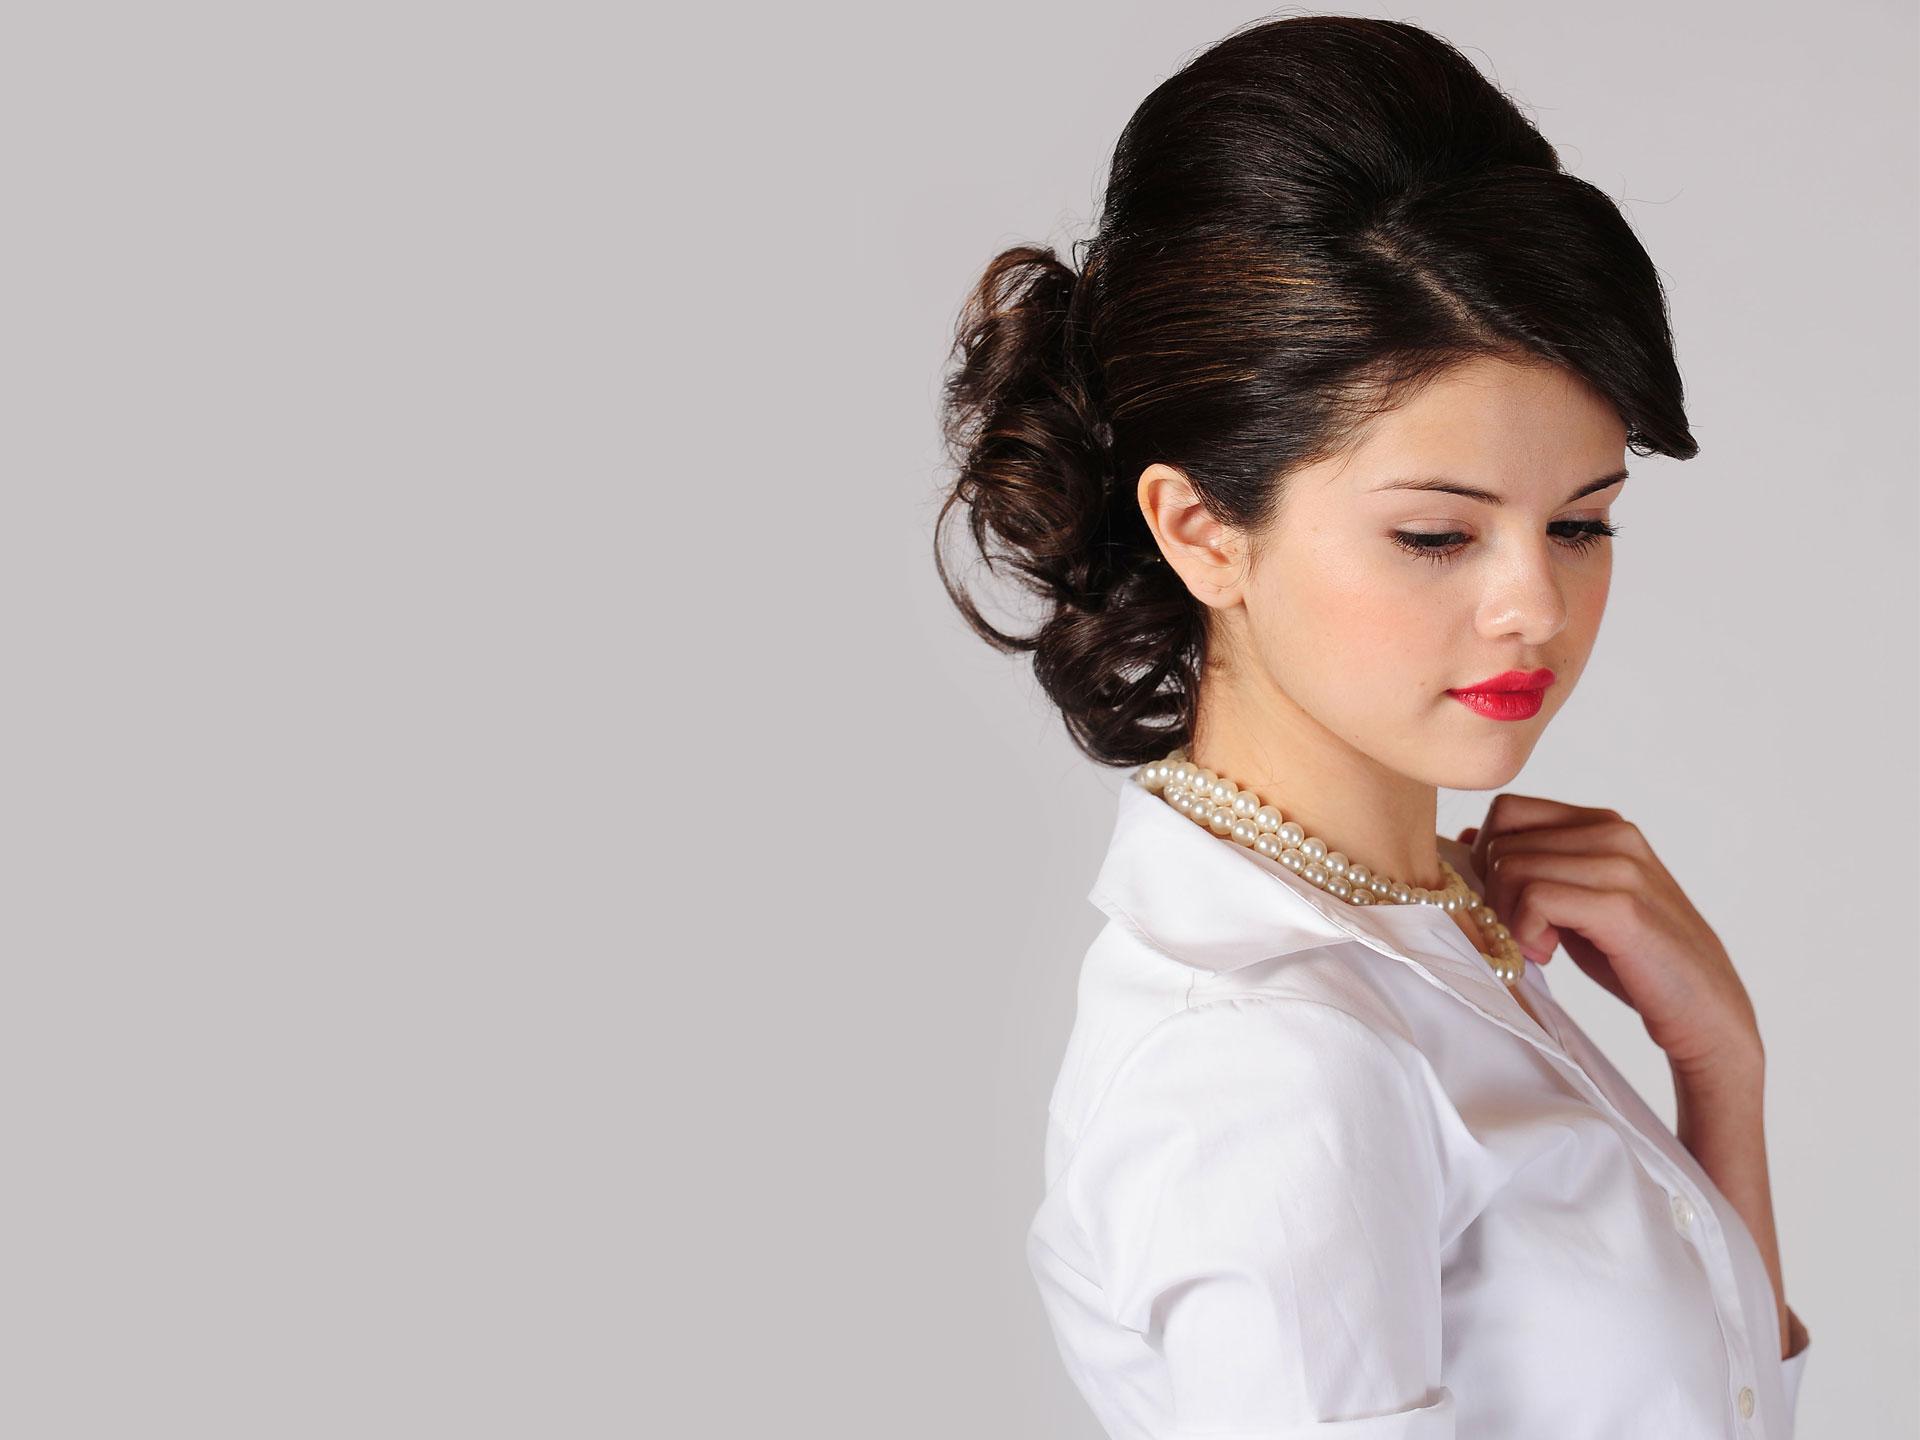 Selena Gomez 6 Wallpapers HD Wallpapers 1920x1440